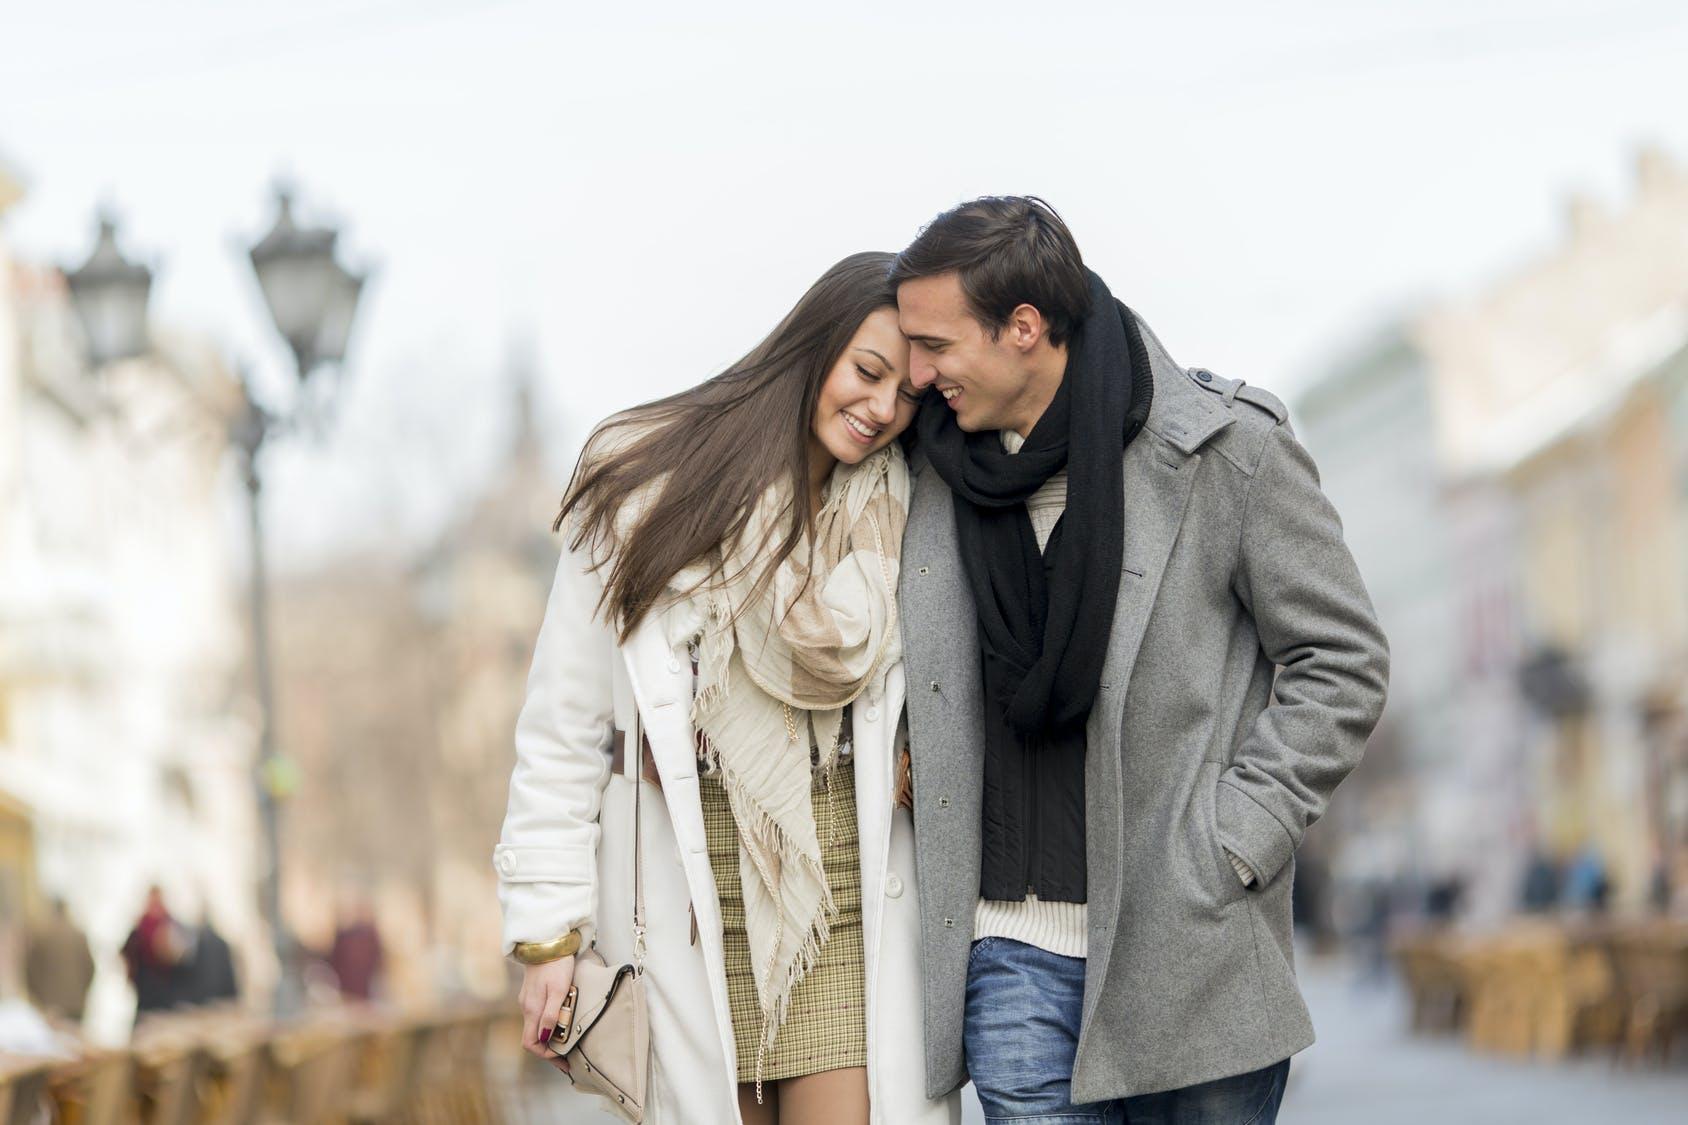 dating ιστοσελίδες αστεία έλεγχος ιστοσελίδων γνωριμιών